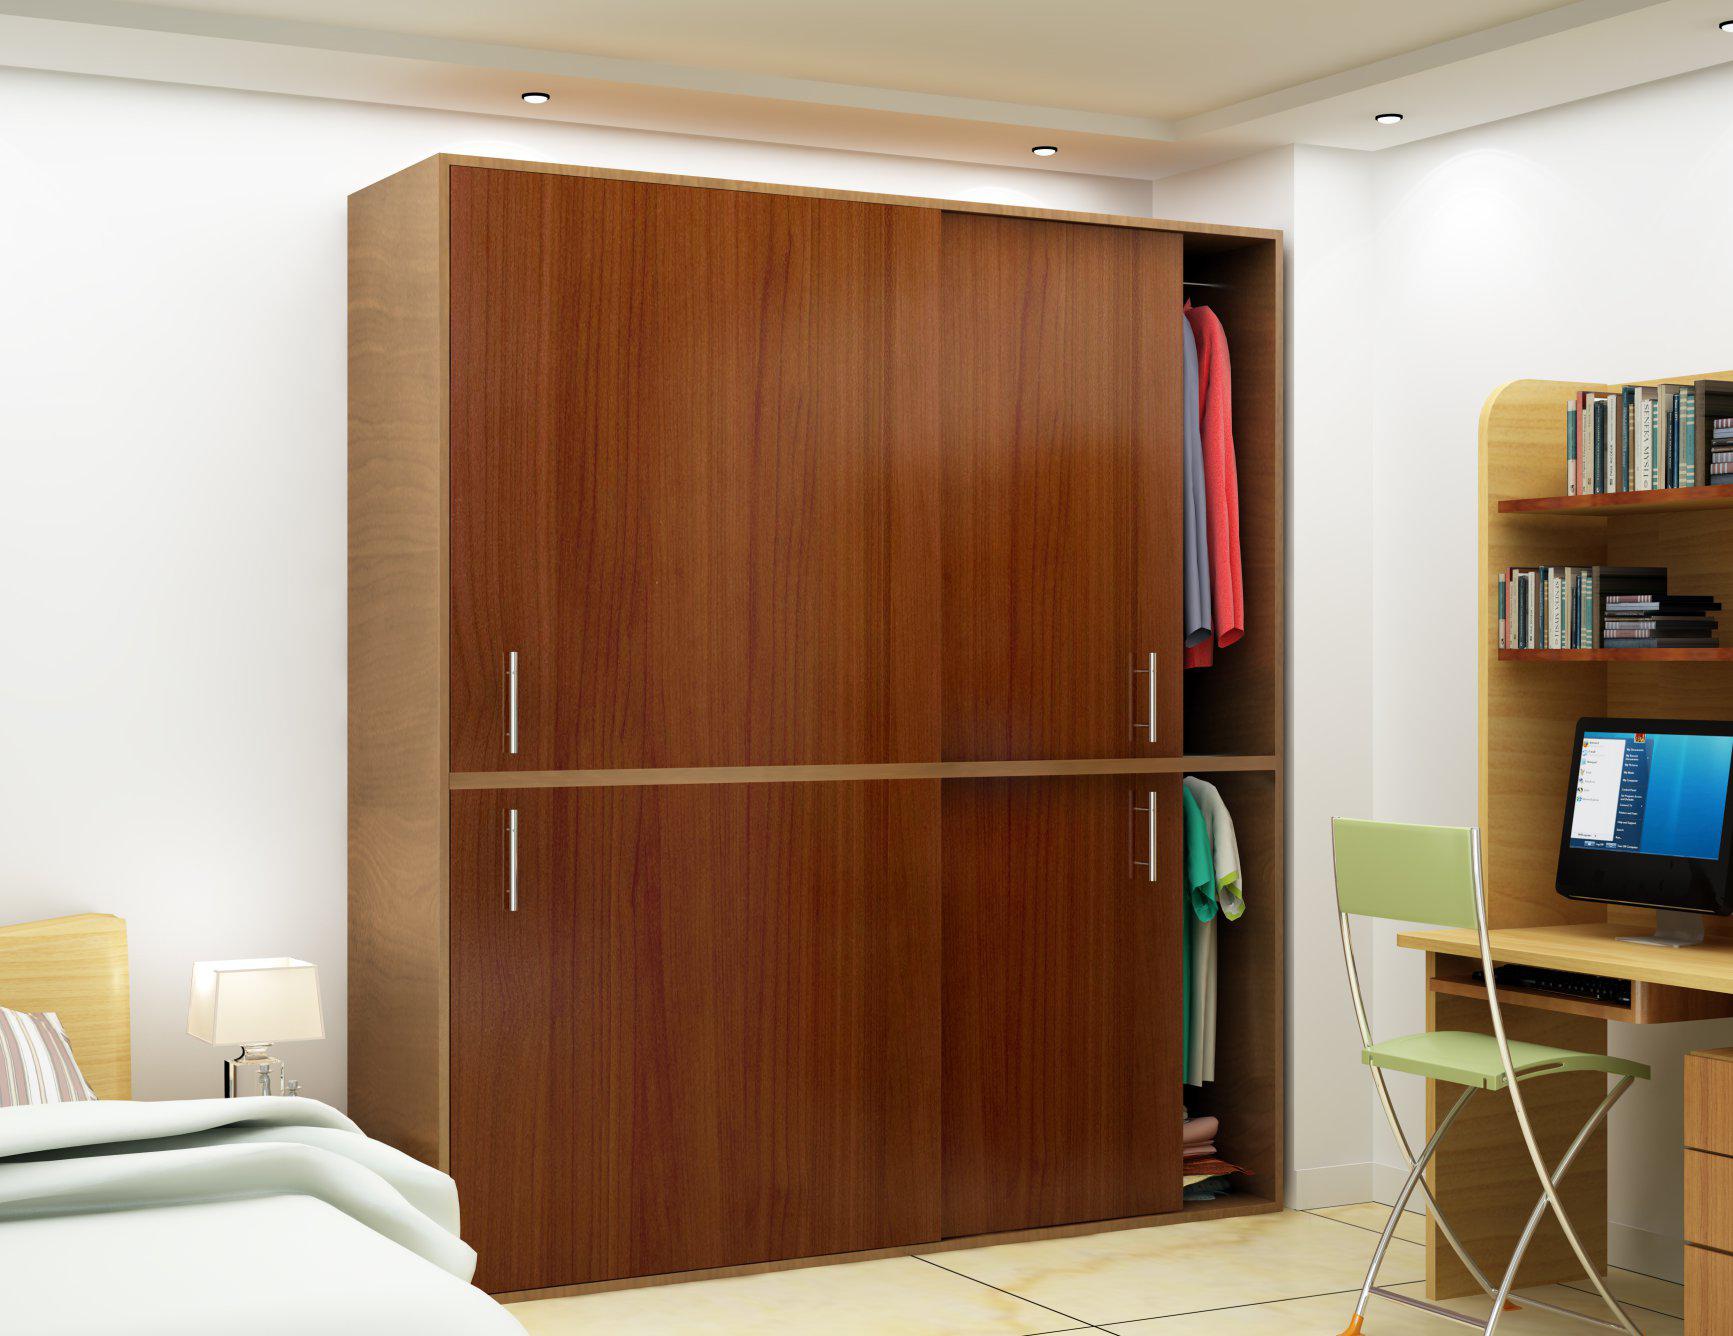 Classic If 45 Sf 53 Sliding System 45 Kg Slido By Hafele Sliding Door Design Modern Sliding Doors Fitted Furniture